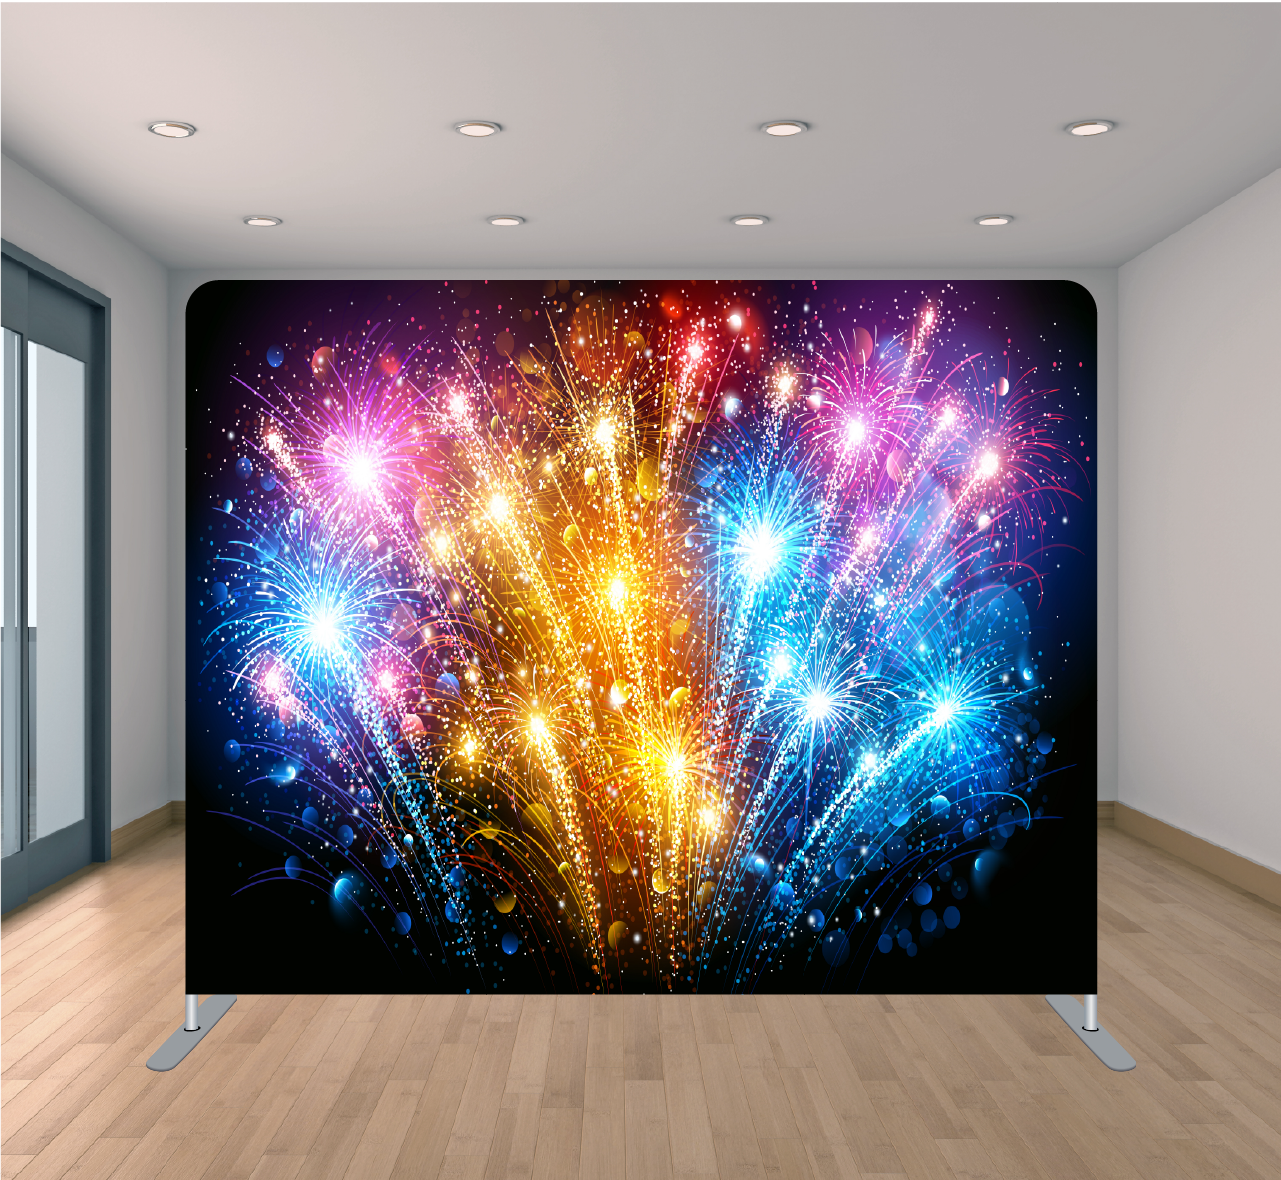 Festive_Fireworks-01